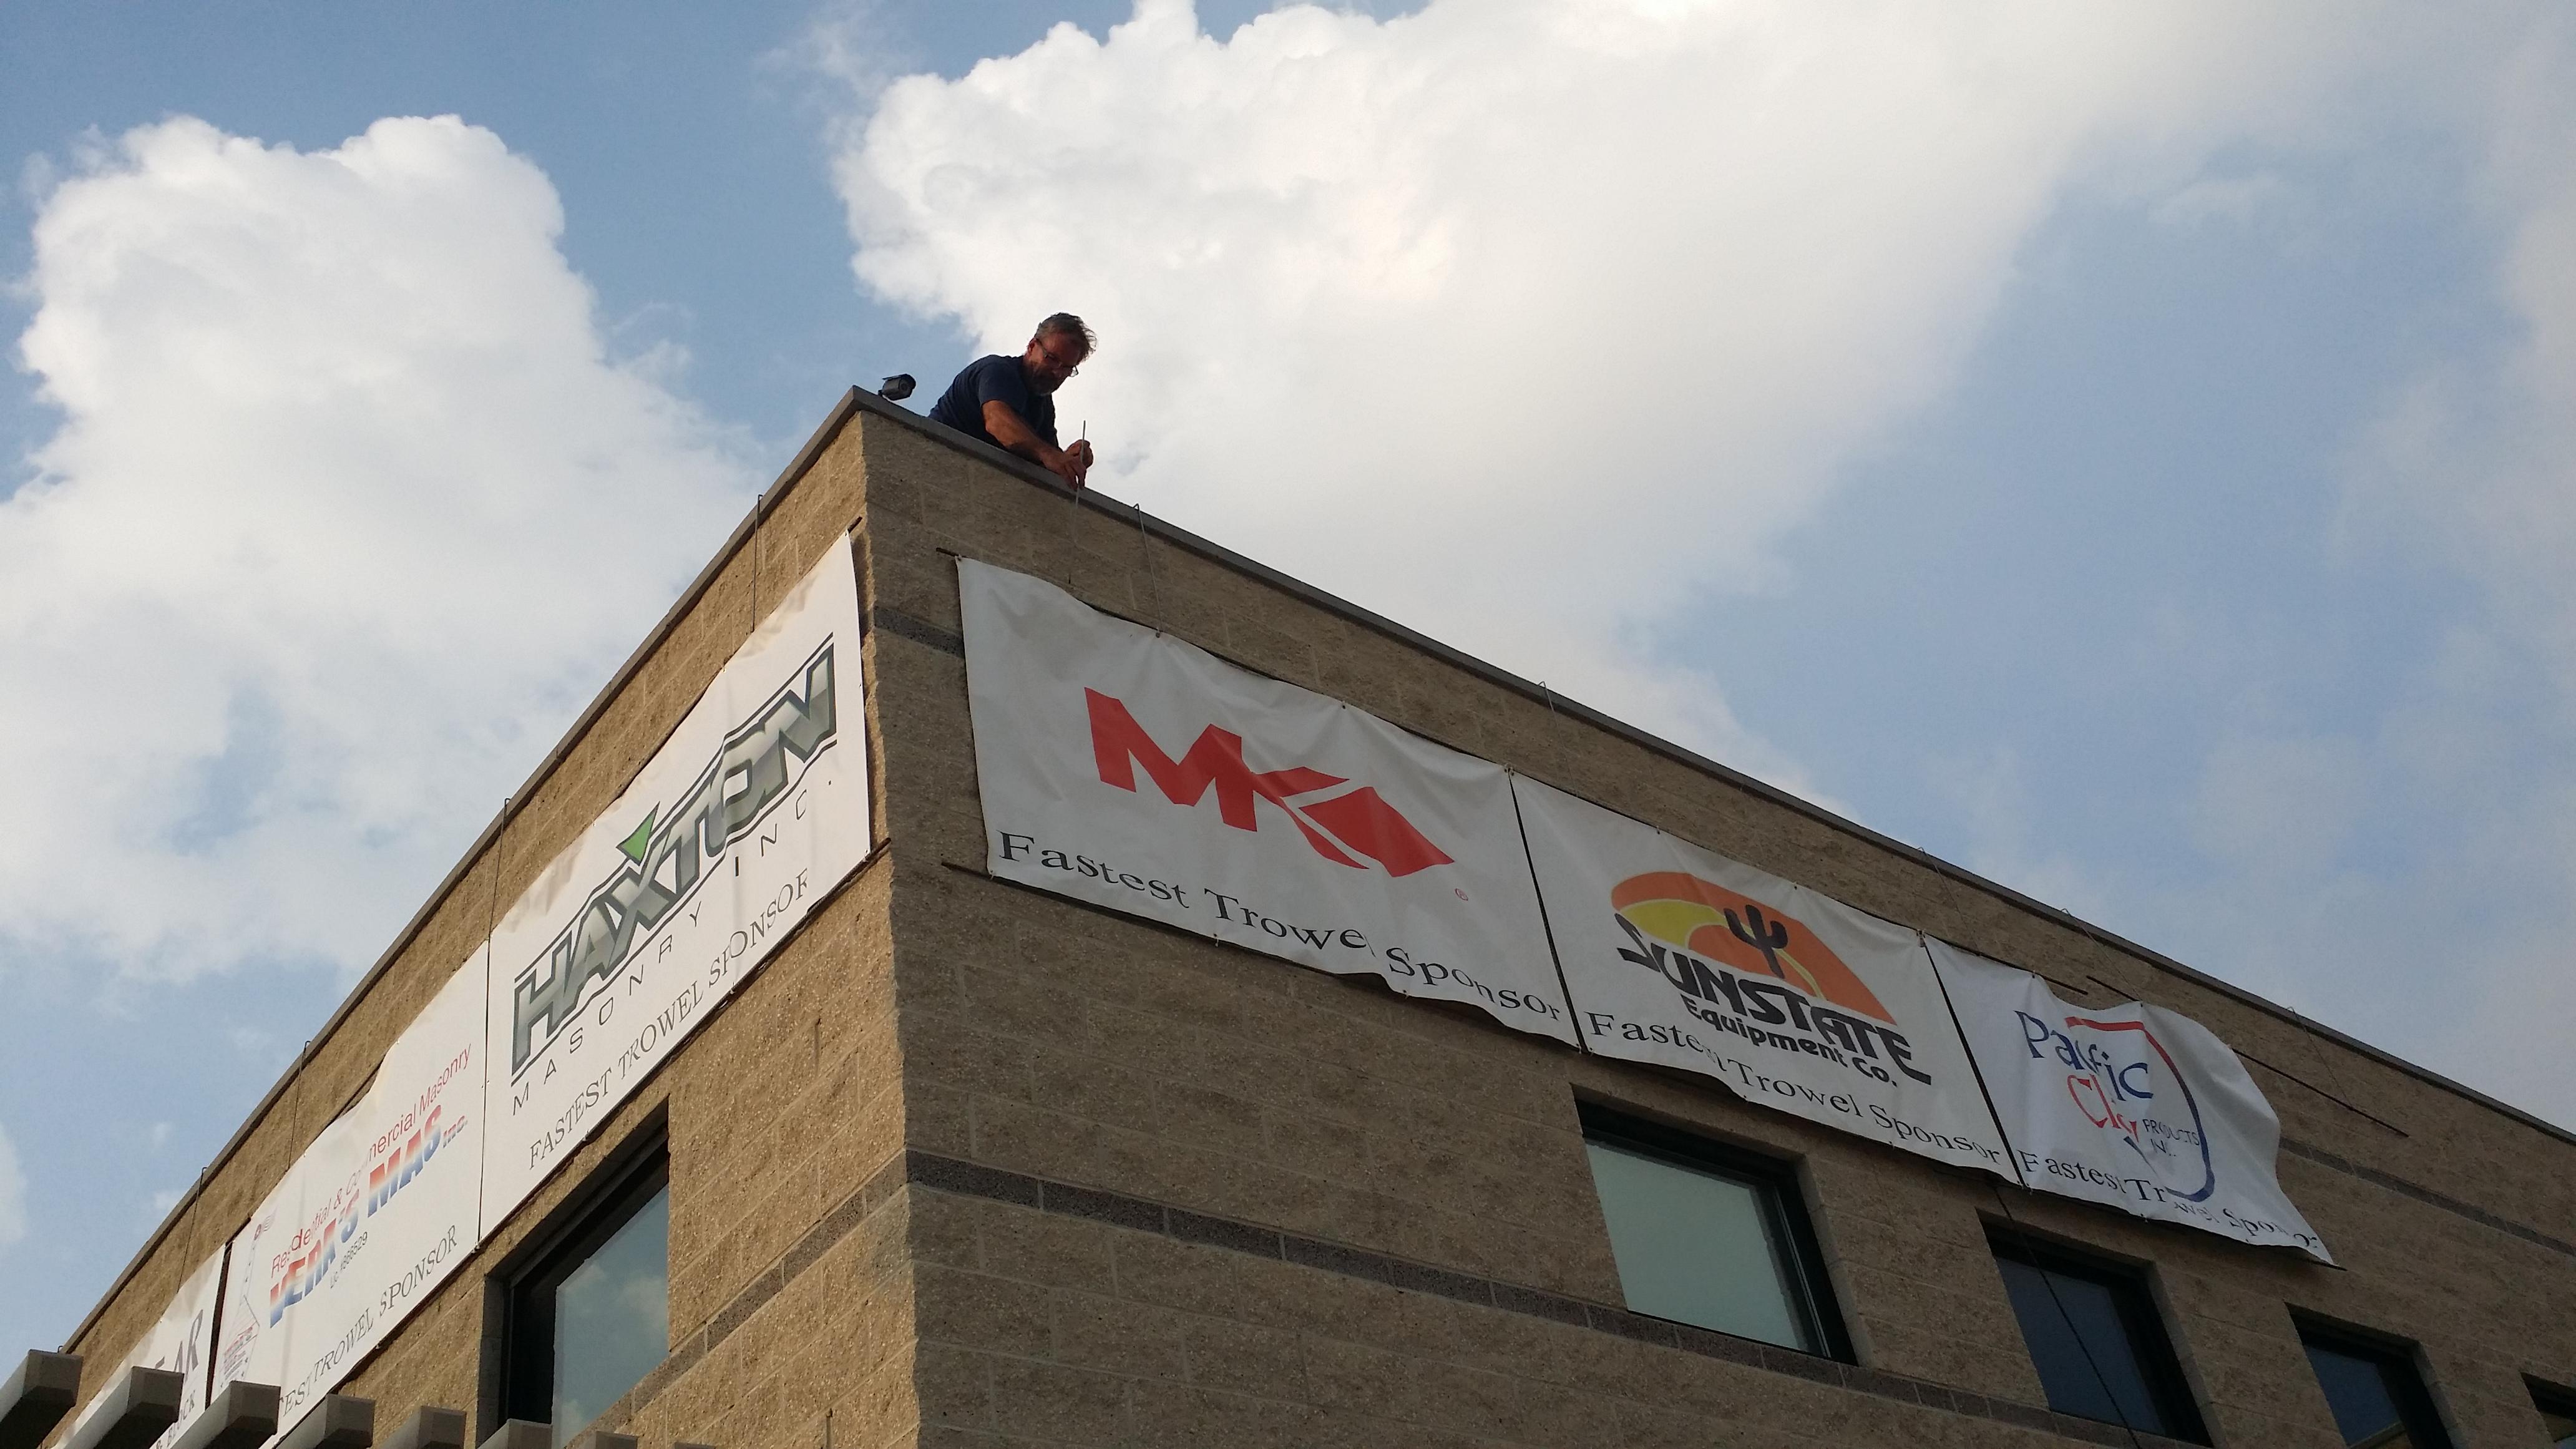 Mike Baumgarten hangs from the rooftop